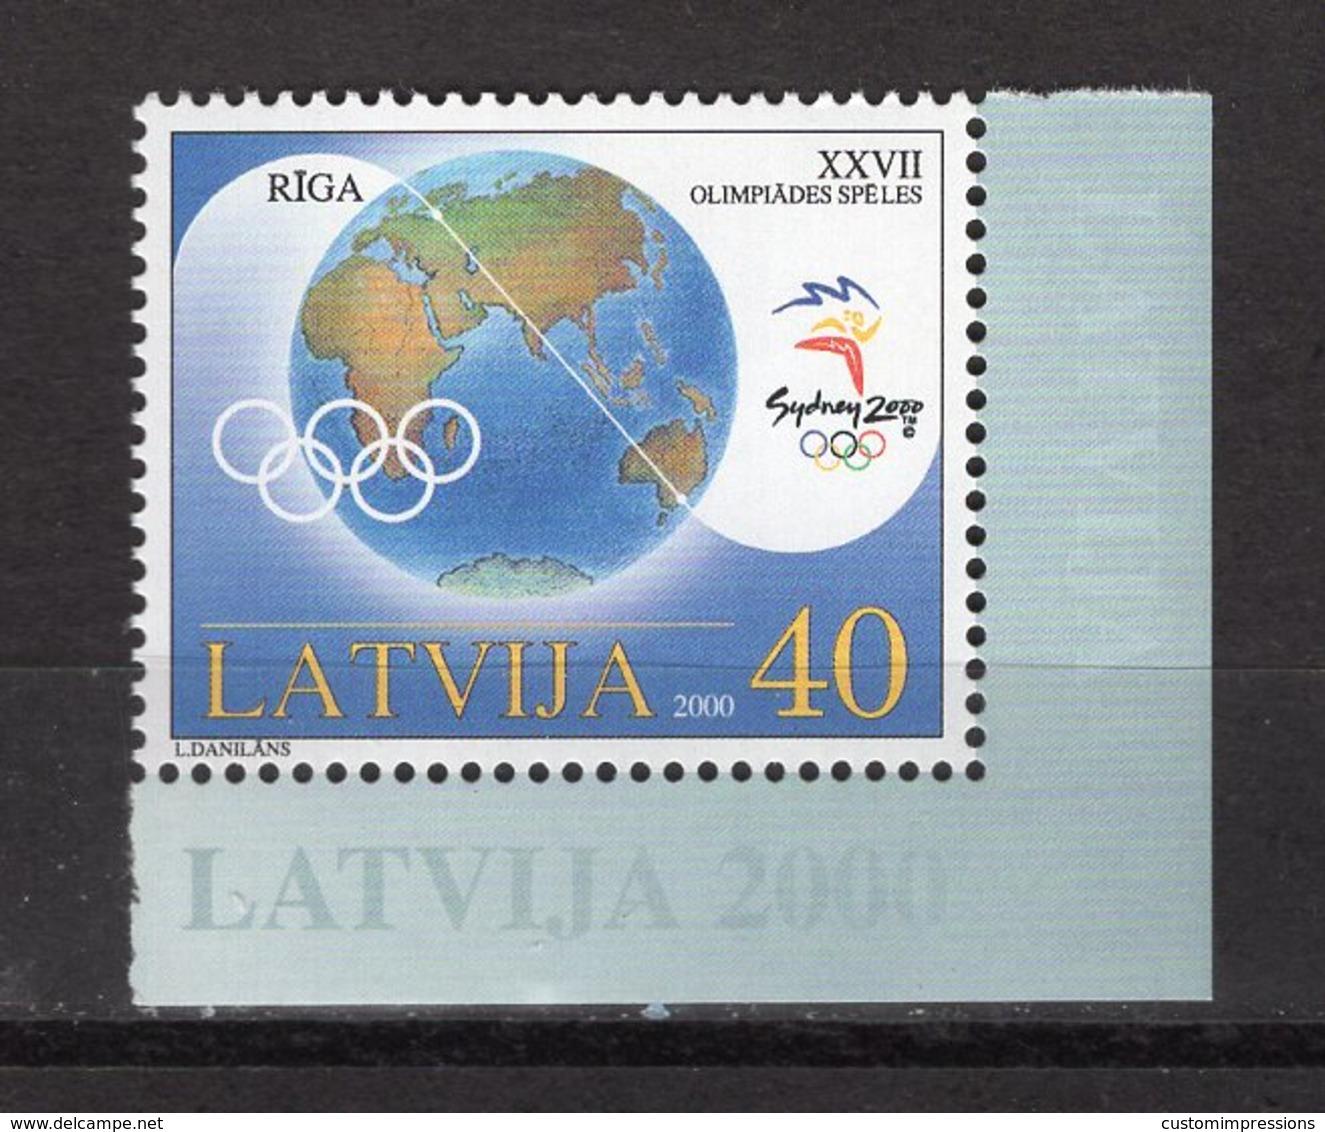 LATVIA -  SYDNEY 2000 OLYMPIC GAMES  O550 - Sommer 2000: Sydney - Paralympics